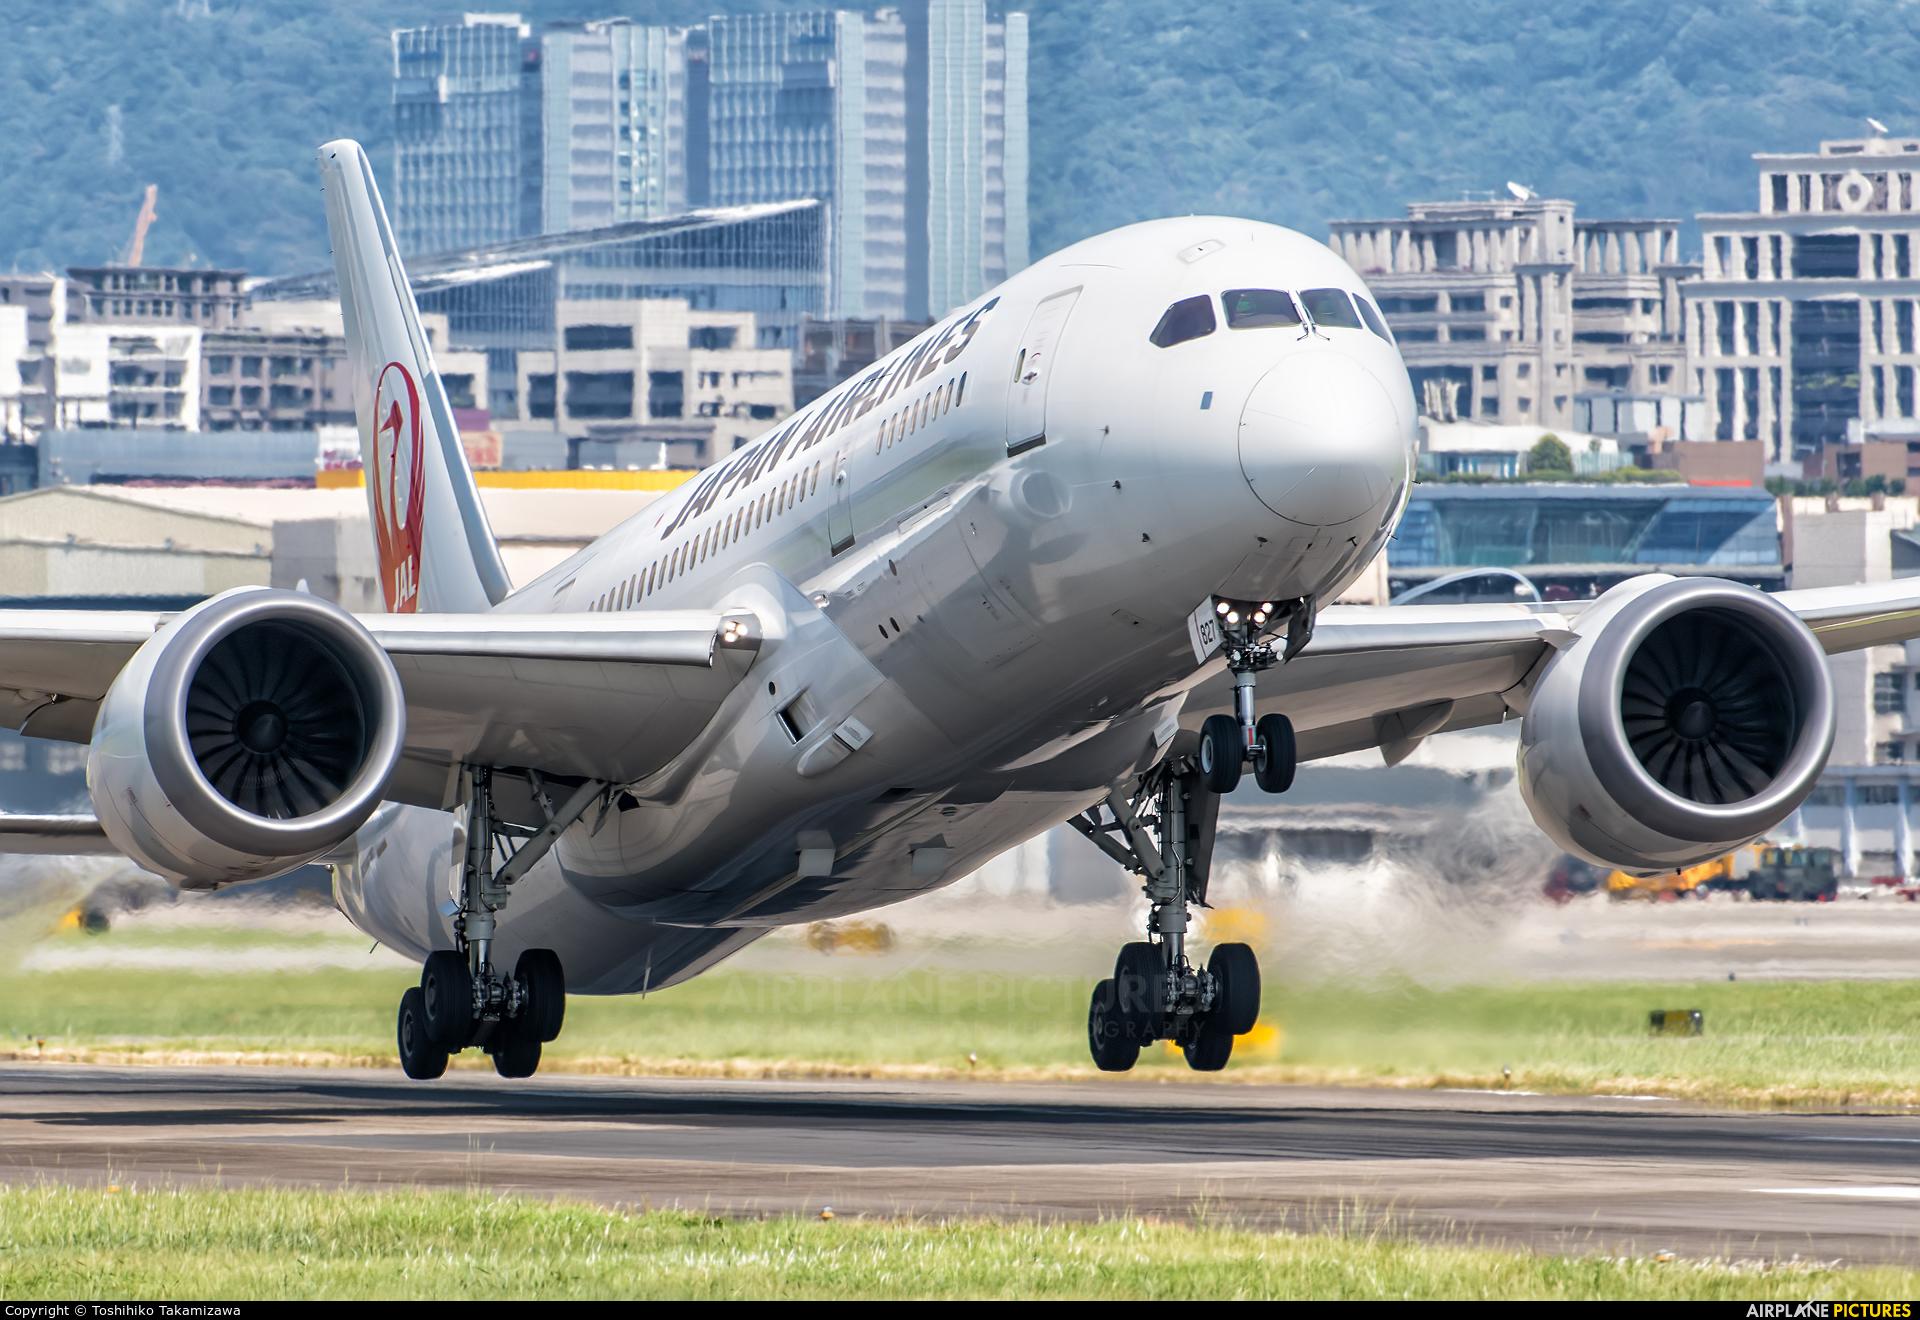 JAL - Japan Airlines JA827J aircraft at Taipei Sung Shan/Songshan Airport